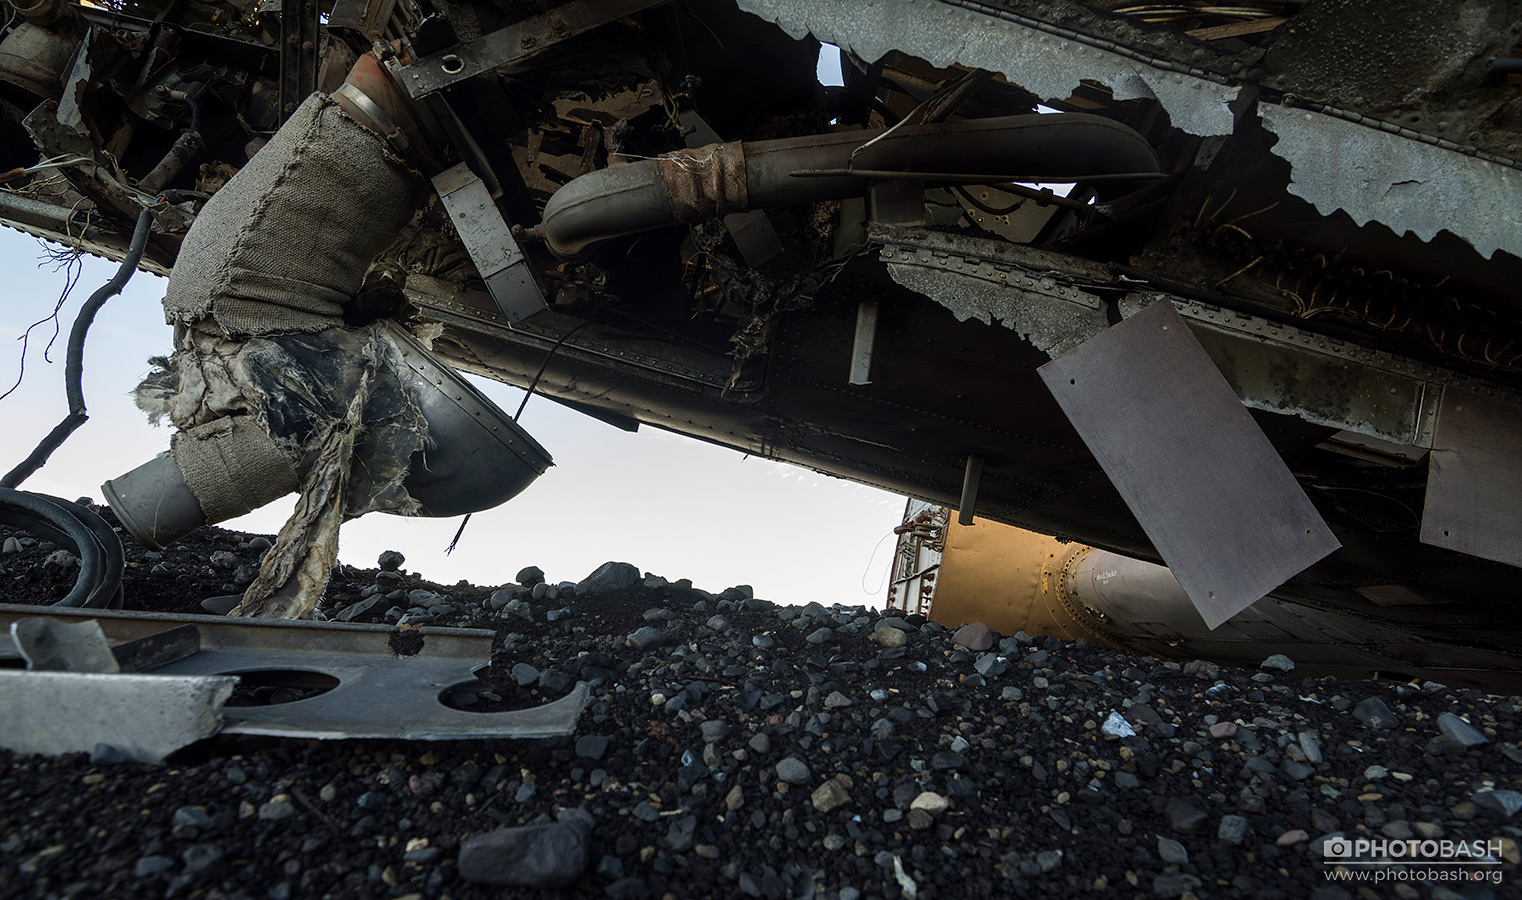 Wrecked-Plane-Scrap-Metal.jpg